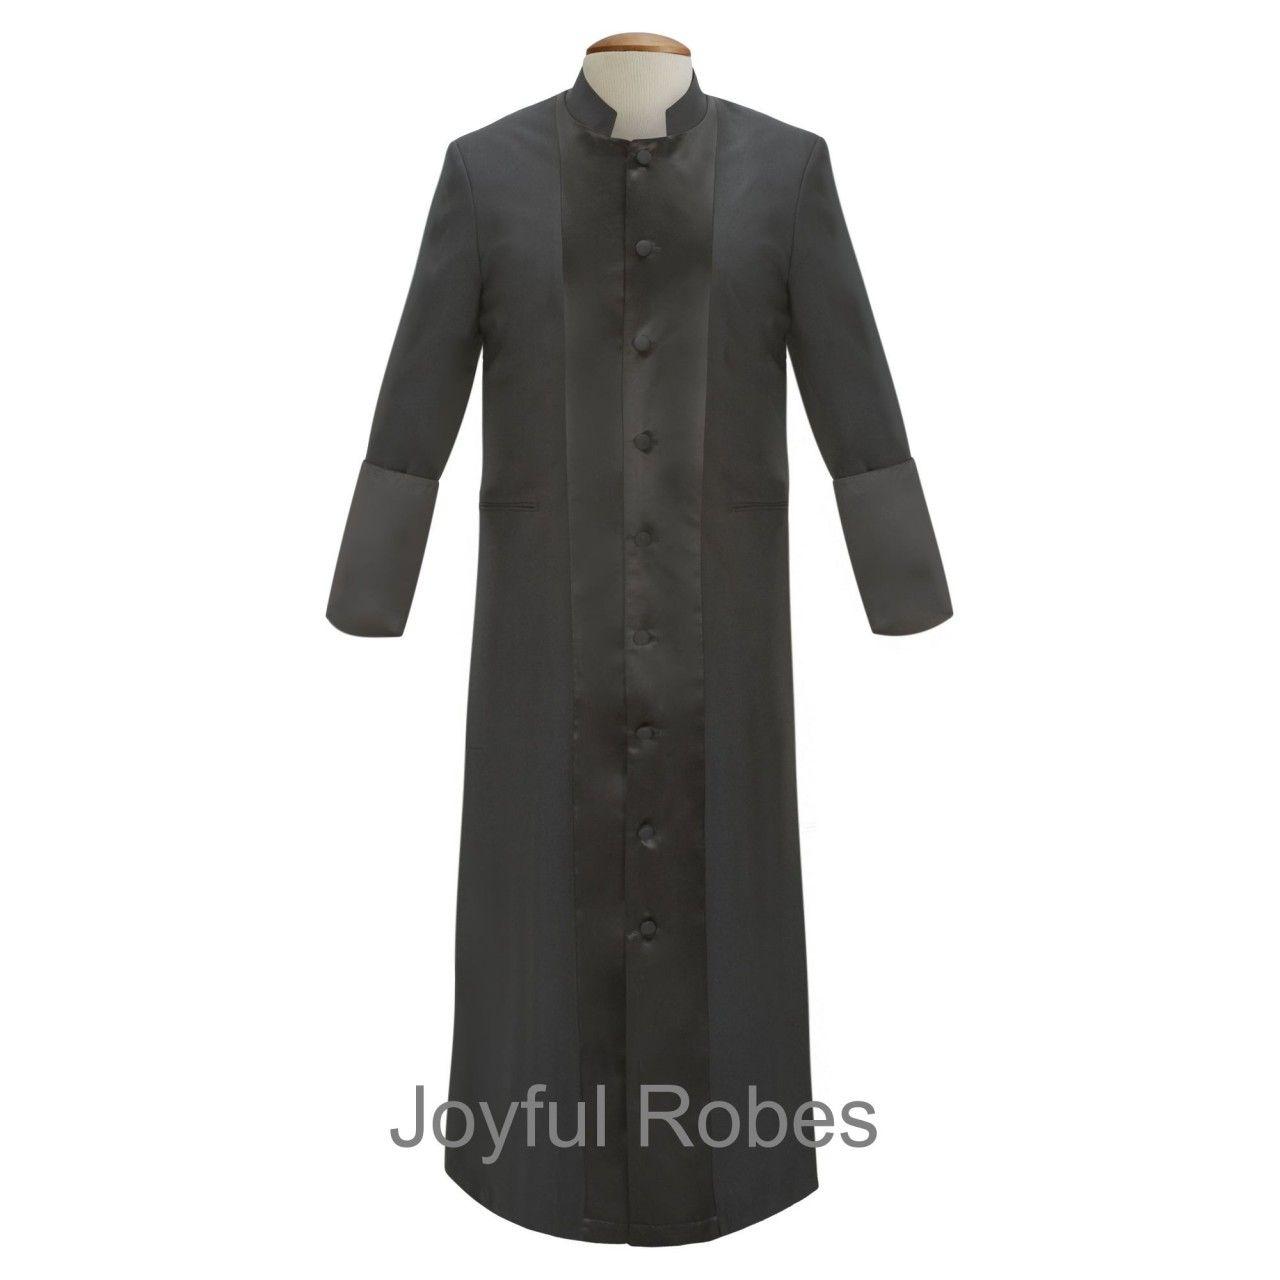 126 M. Men's Satin Pastor/Clergy Robe - Black/Black